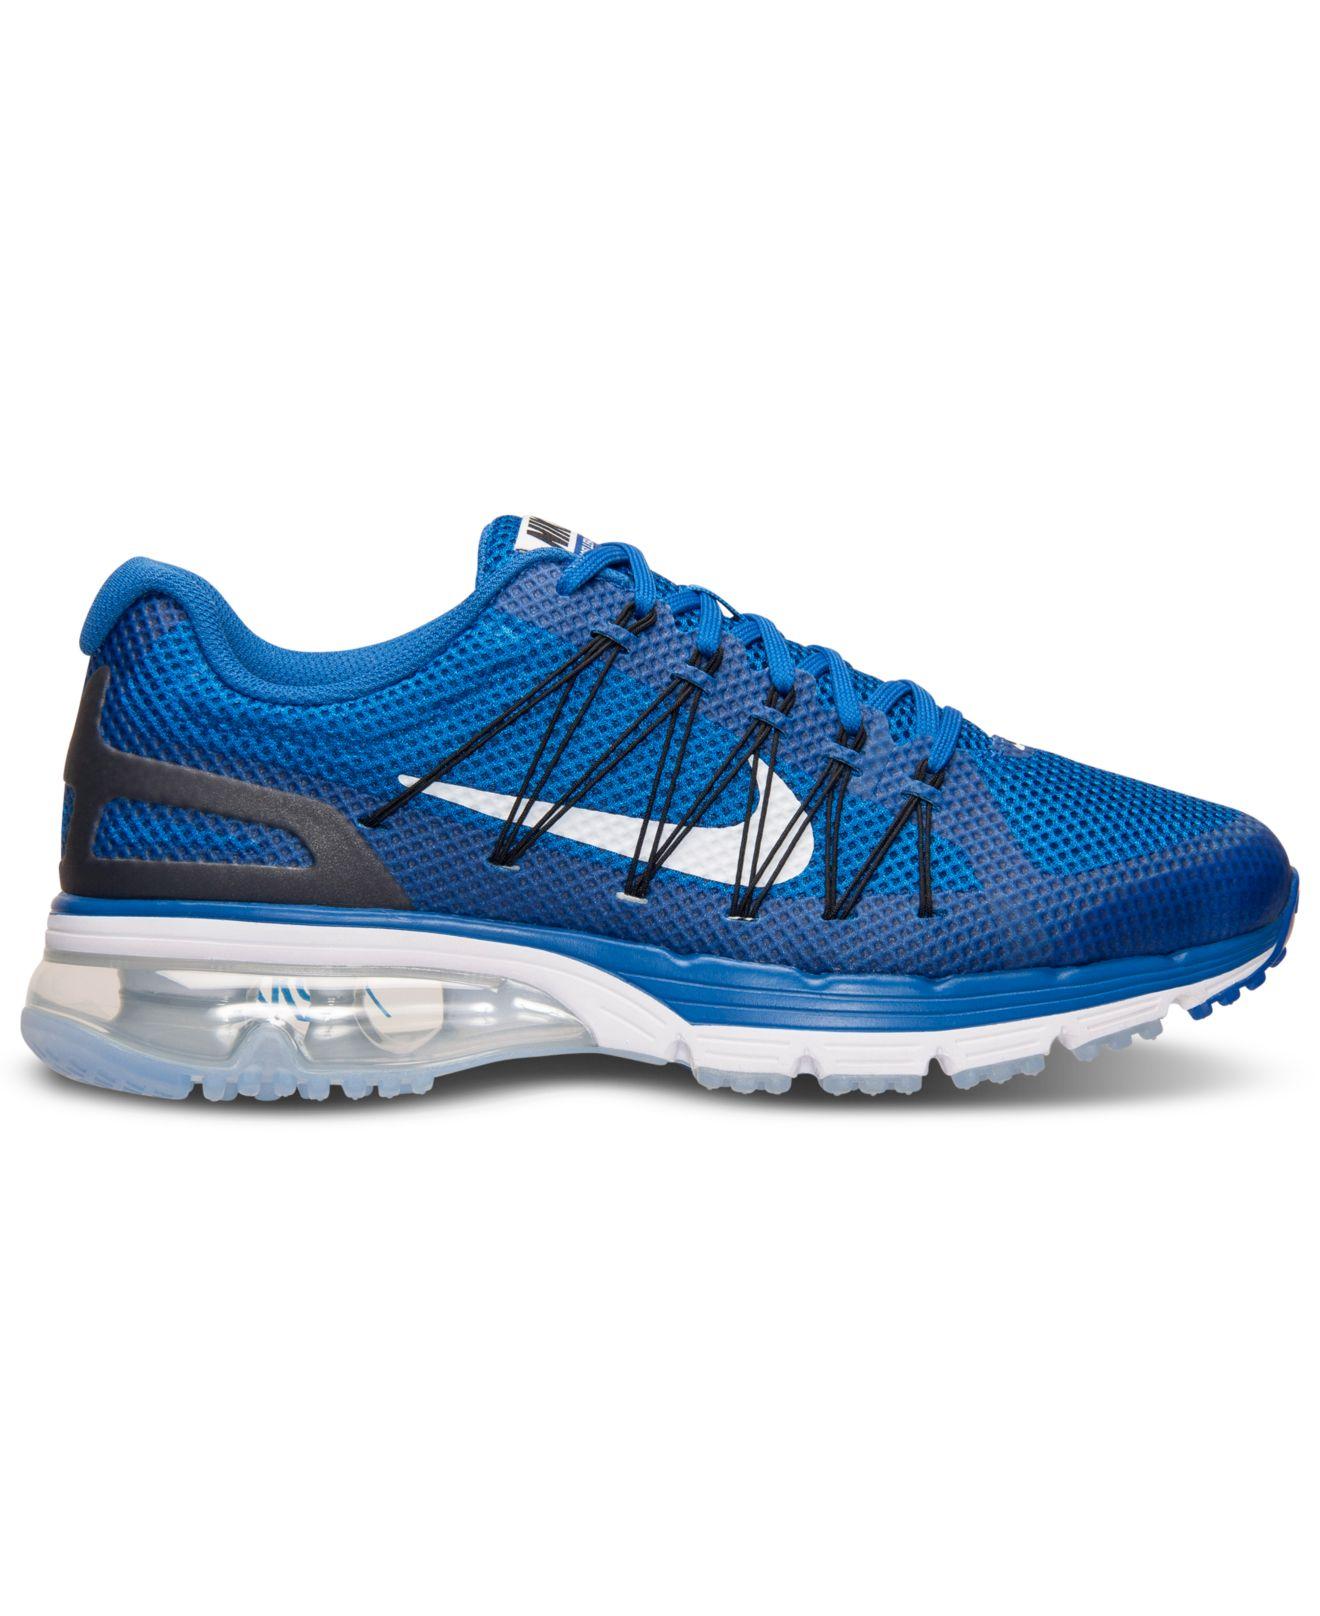 Air Max Excellerate 3 Blue